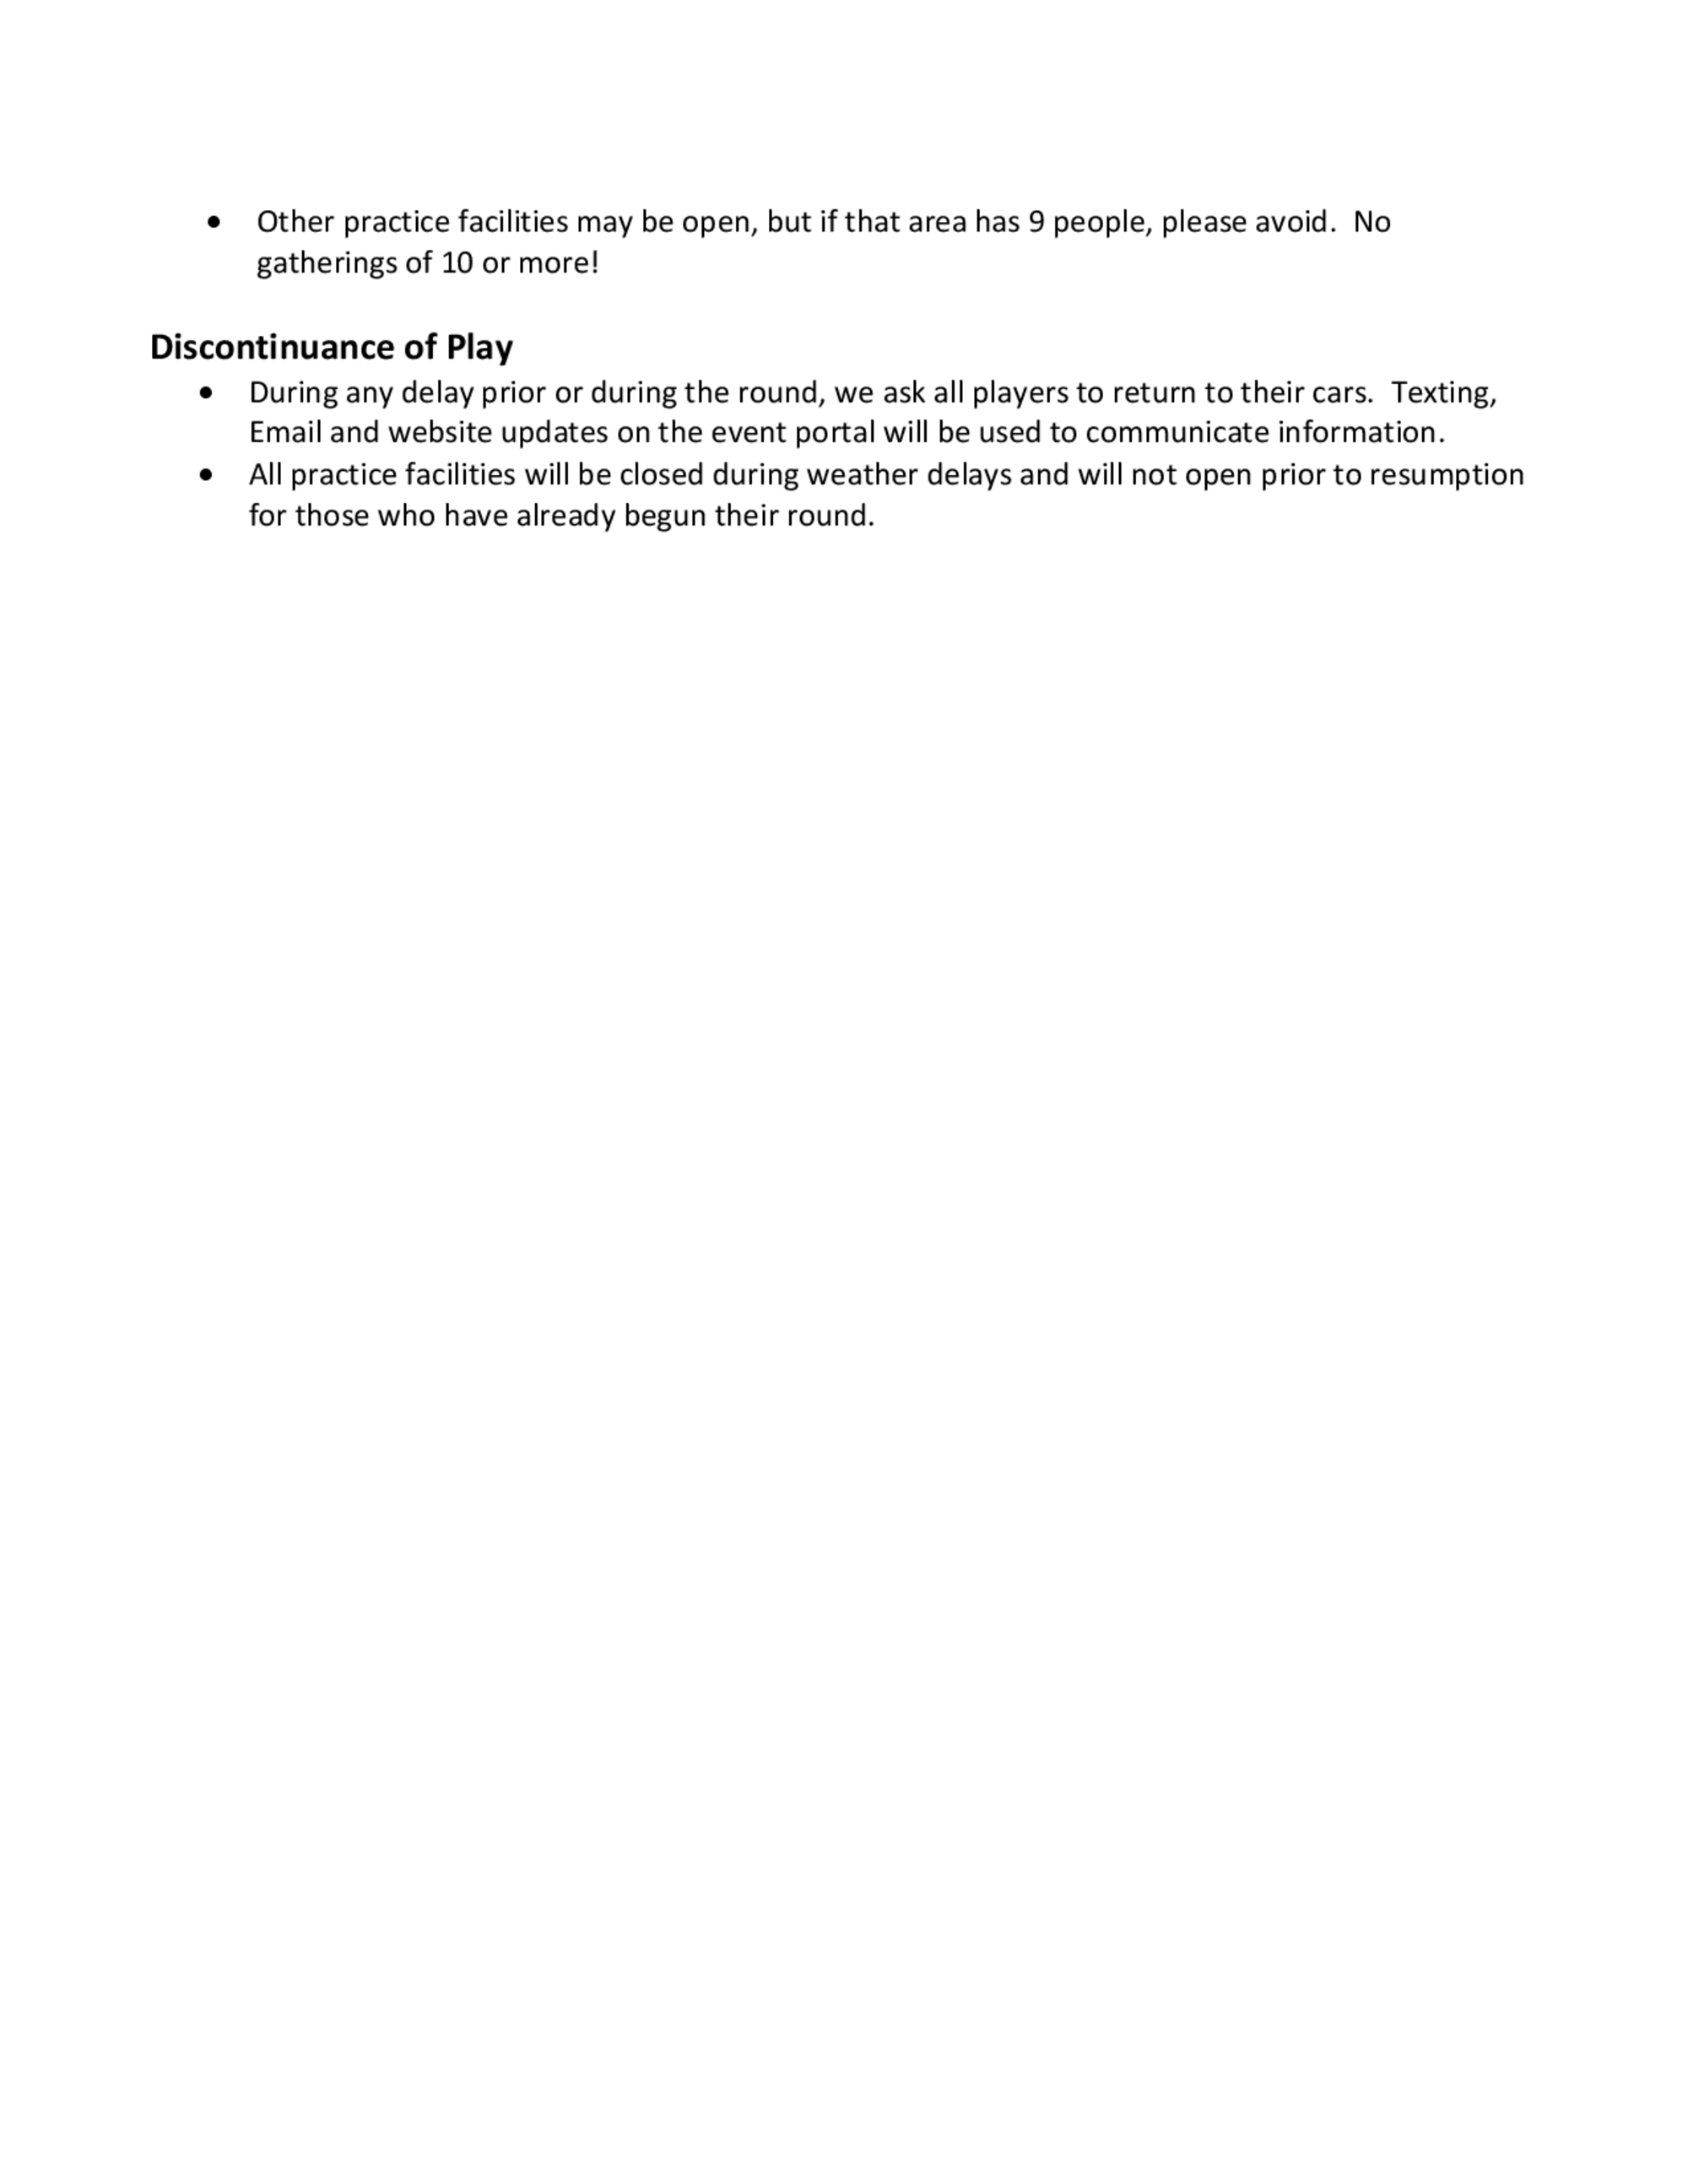 Covid 19 policies 3